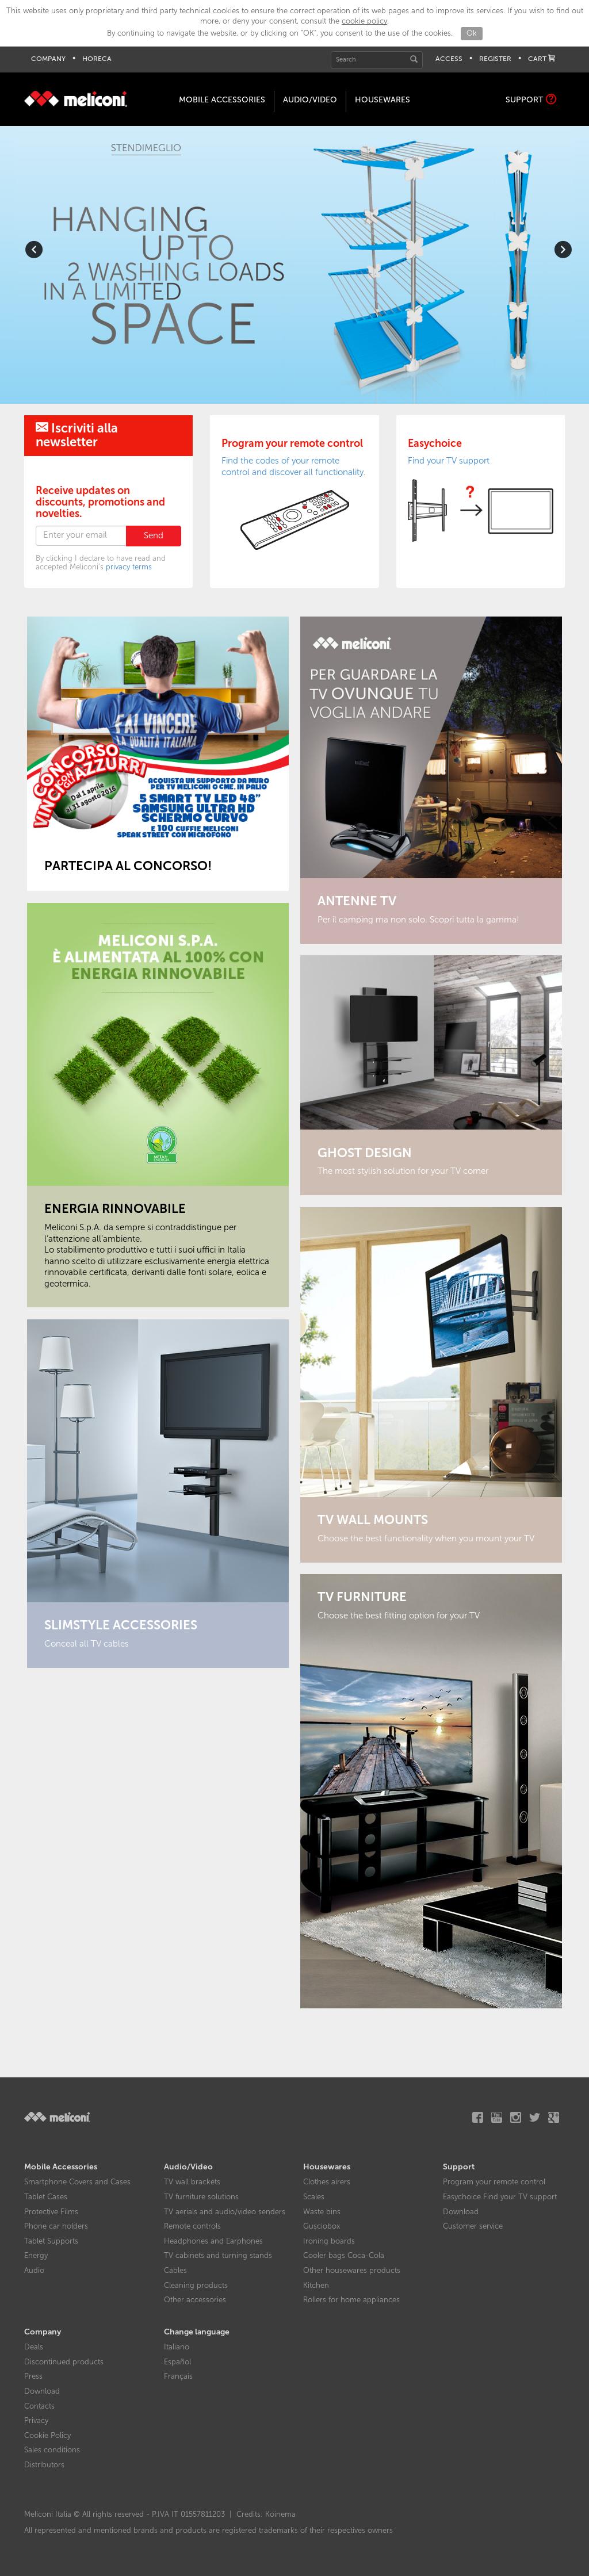 Meliconi Tv Meubel.Meliconi Competitors Revenue And Employees Owler Company Profile